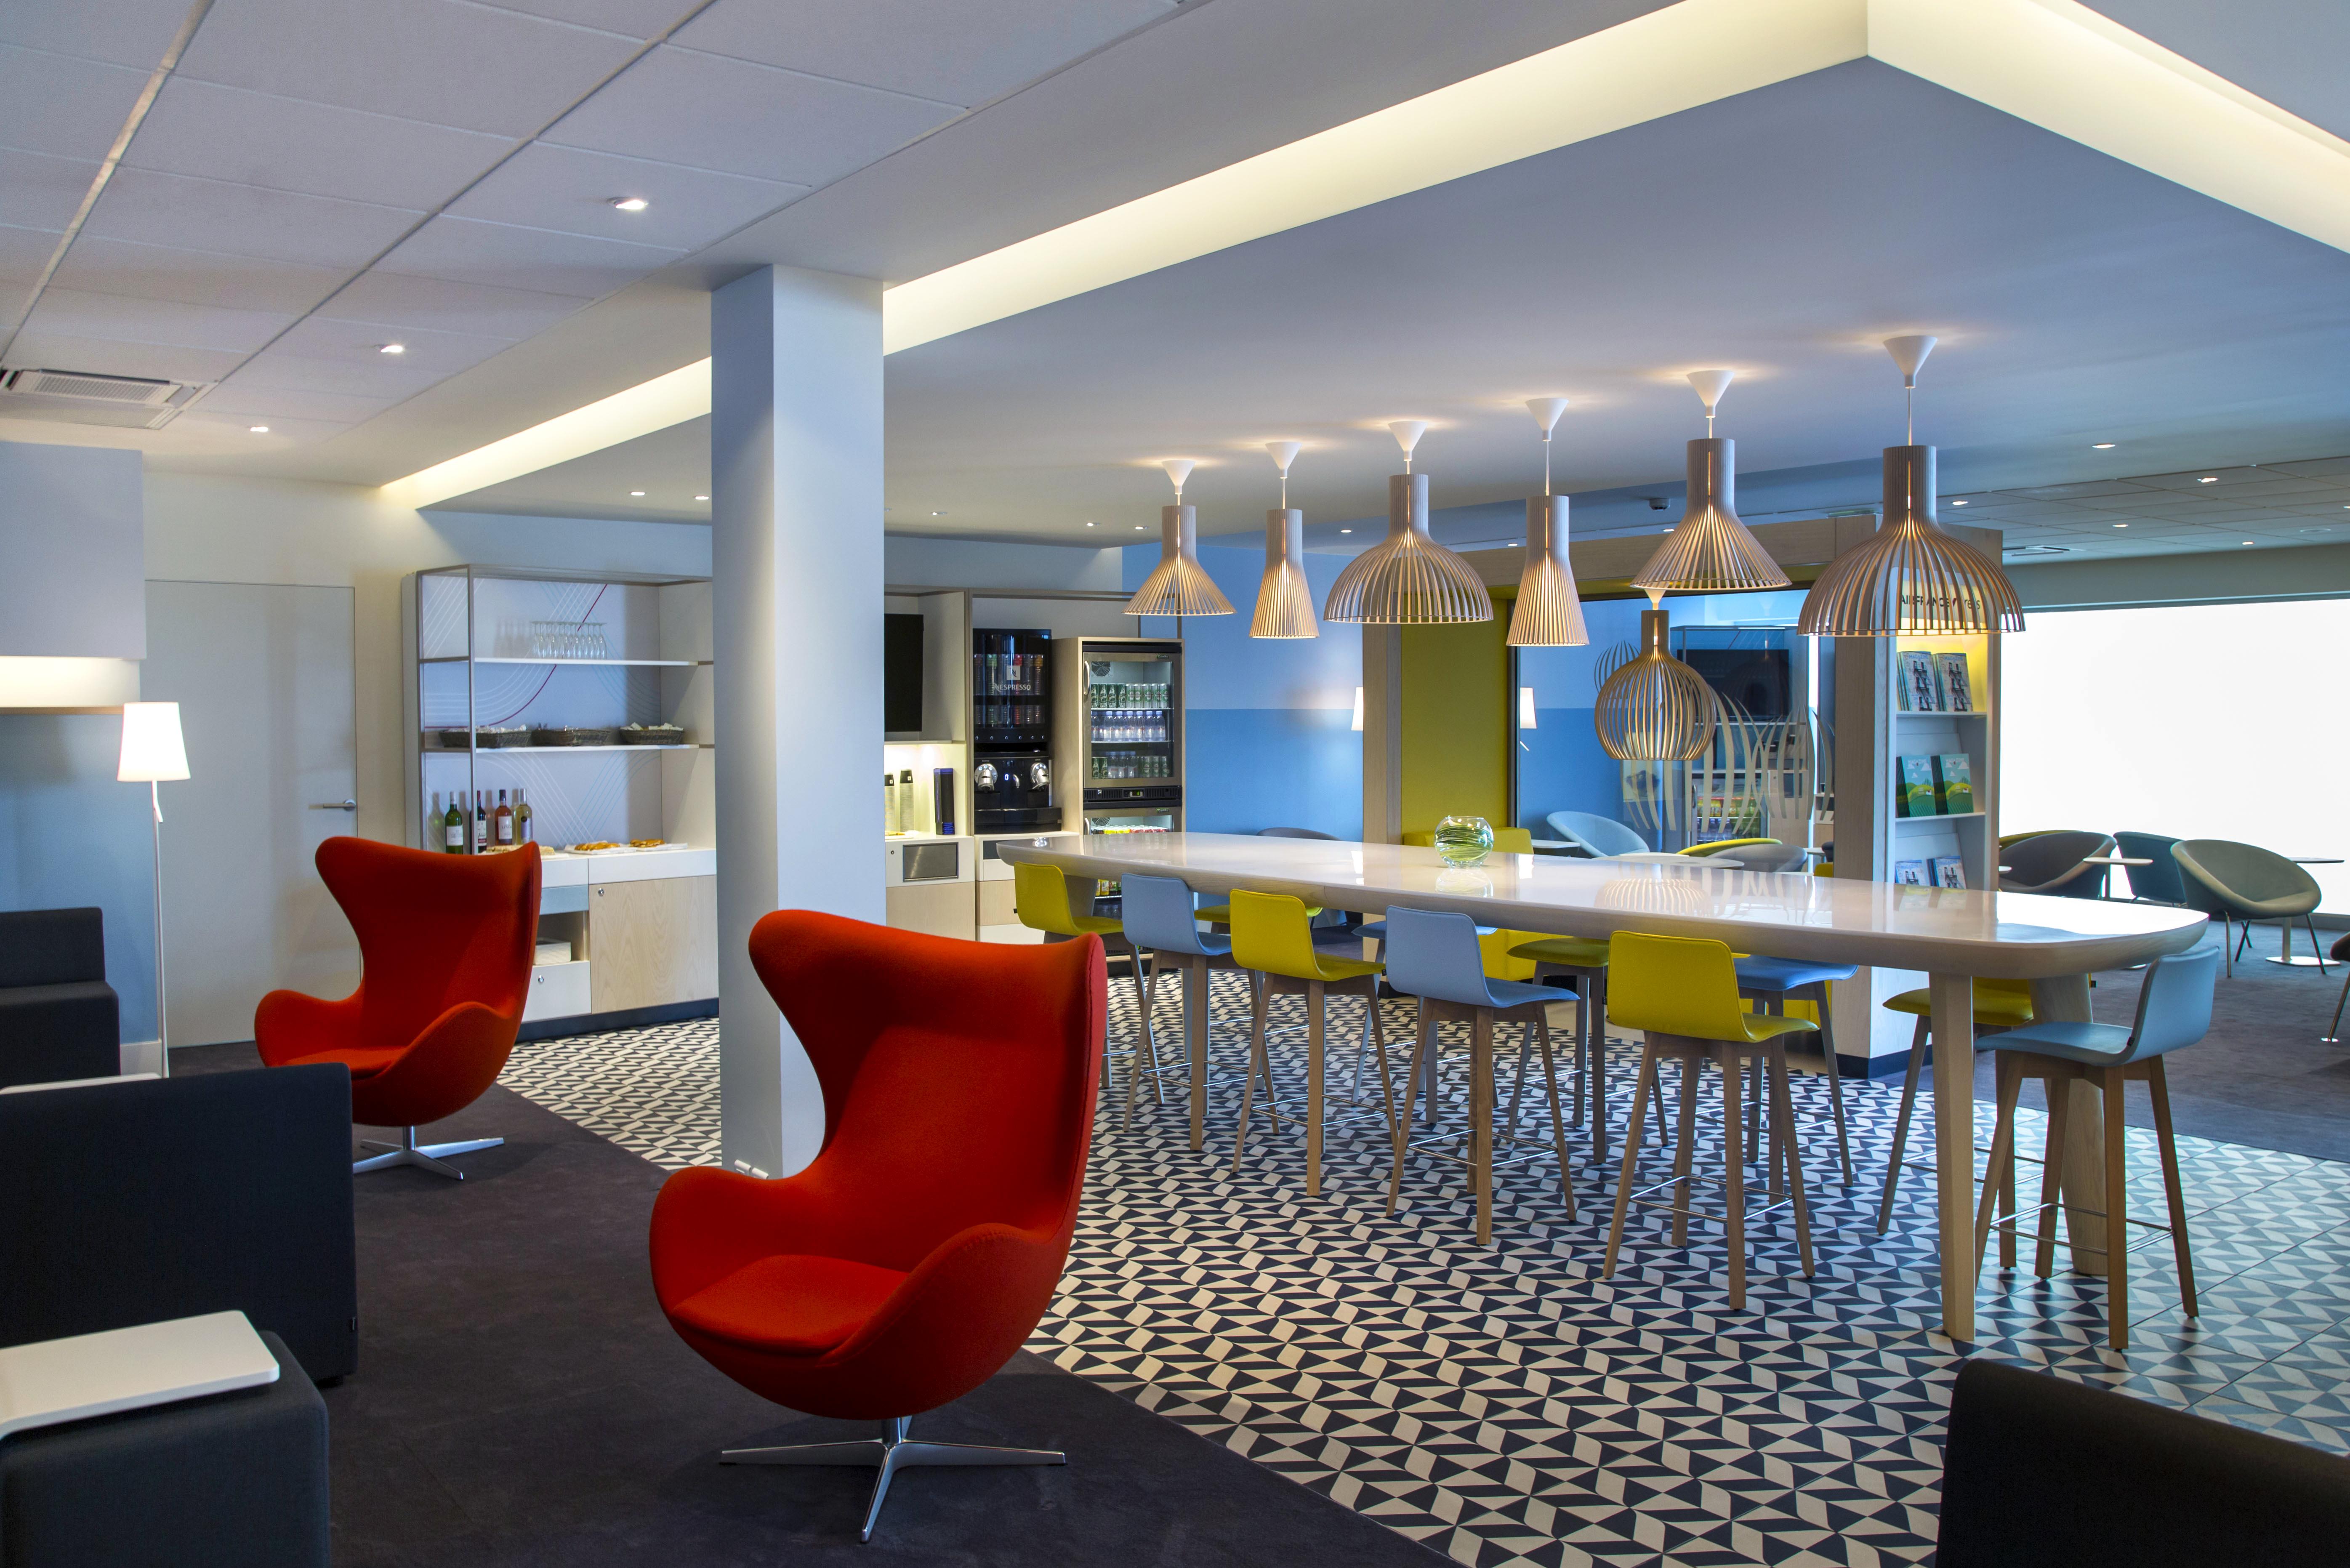 Air france create regional designer lounge in bordeaux for Salon the bordeaux